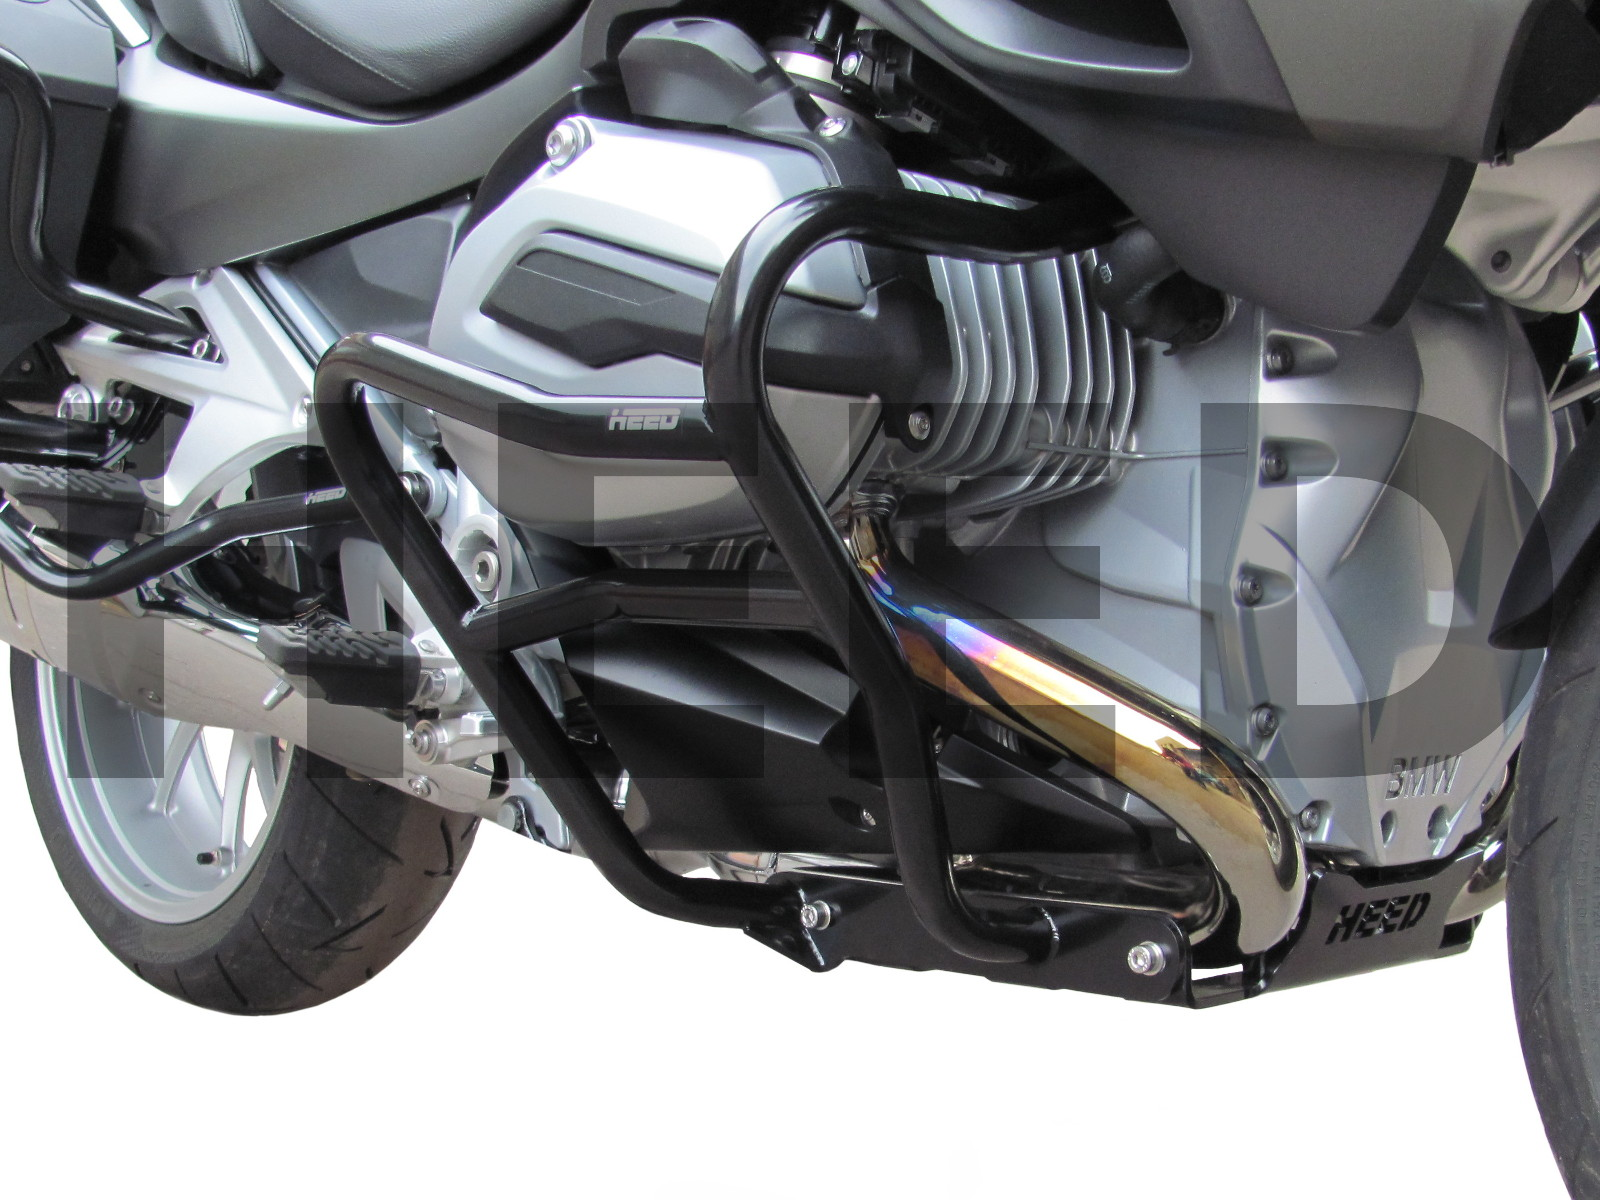 Sturzbügel Schutzbügel Heed BMW R 1200 RT LC Crash Bars Schwarz 2014-2018